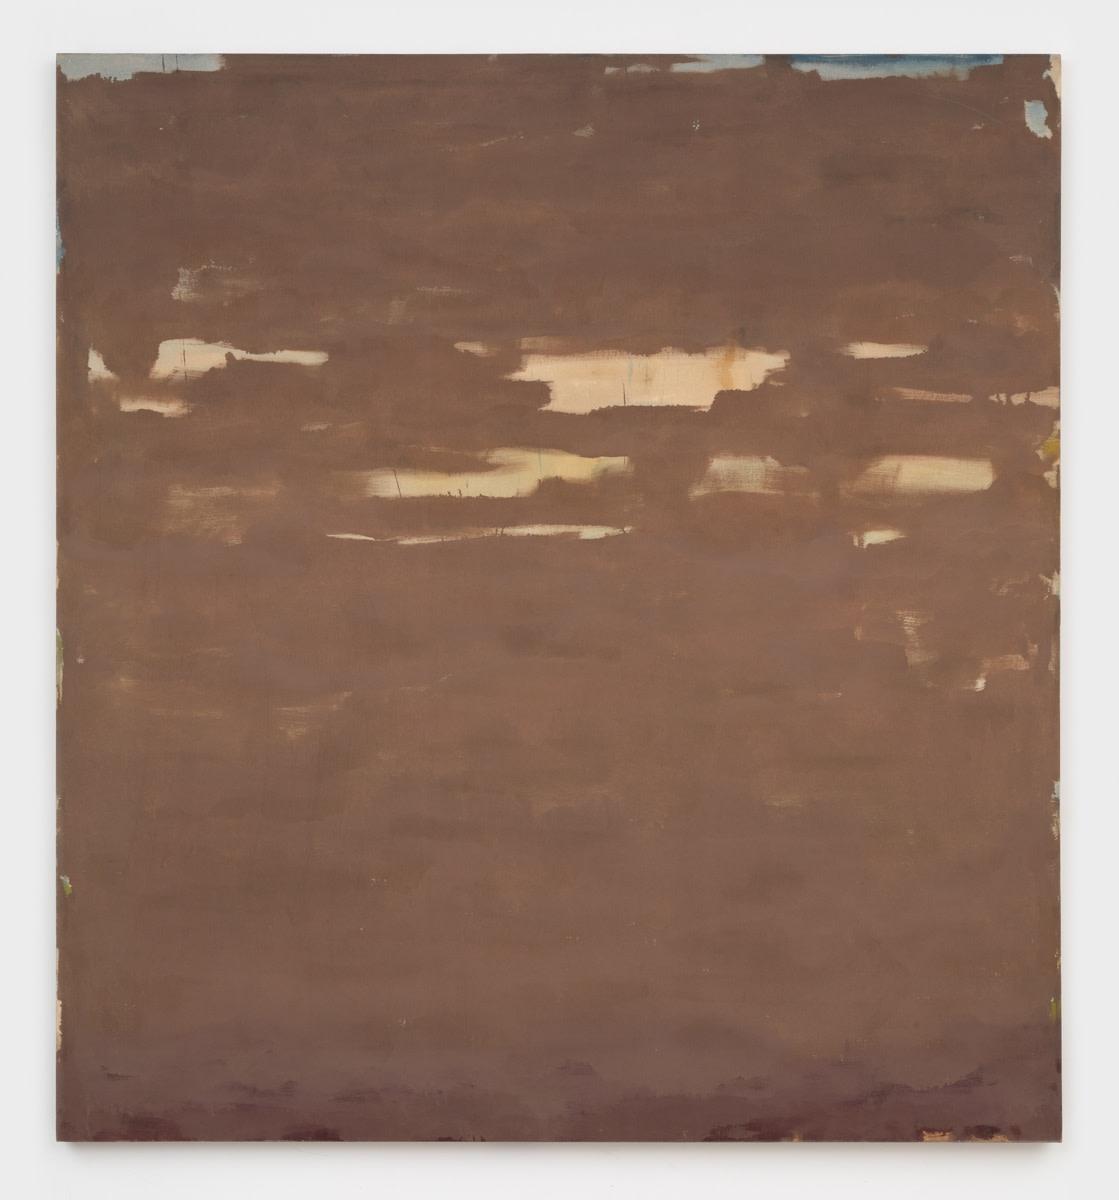 Virginia Jaramillo Terra II, 1976 Acrylic on canvas 198.1 x 182.9 cm 78 x 72 in Inquire